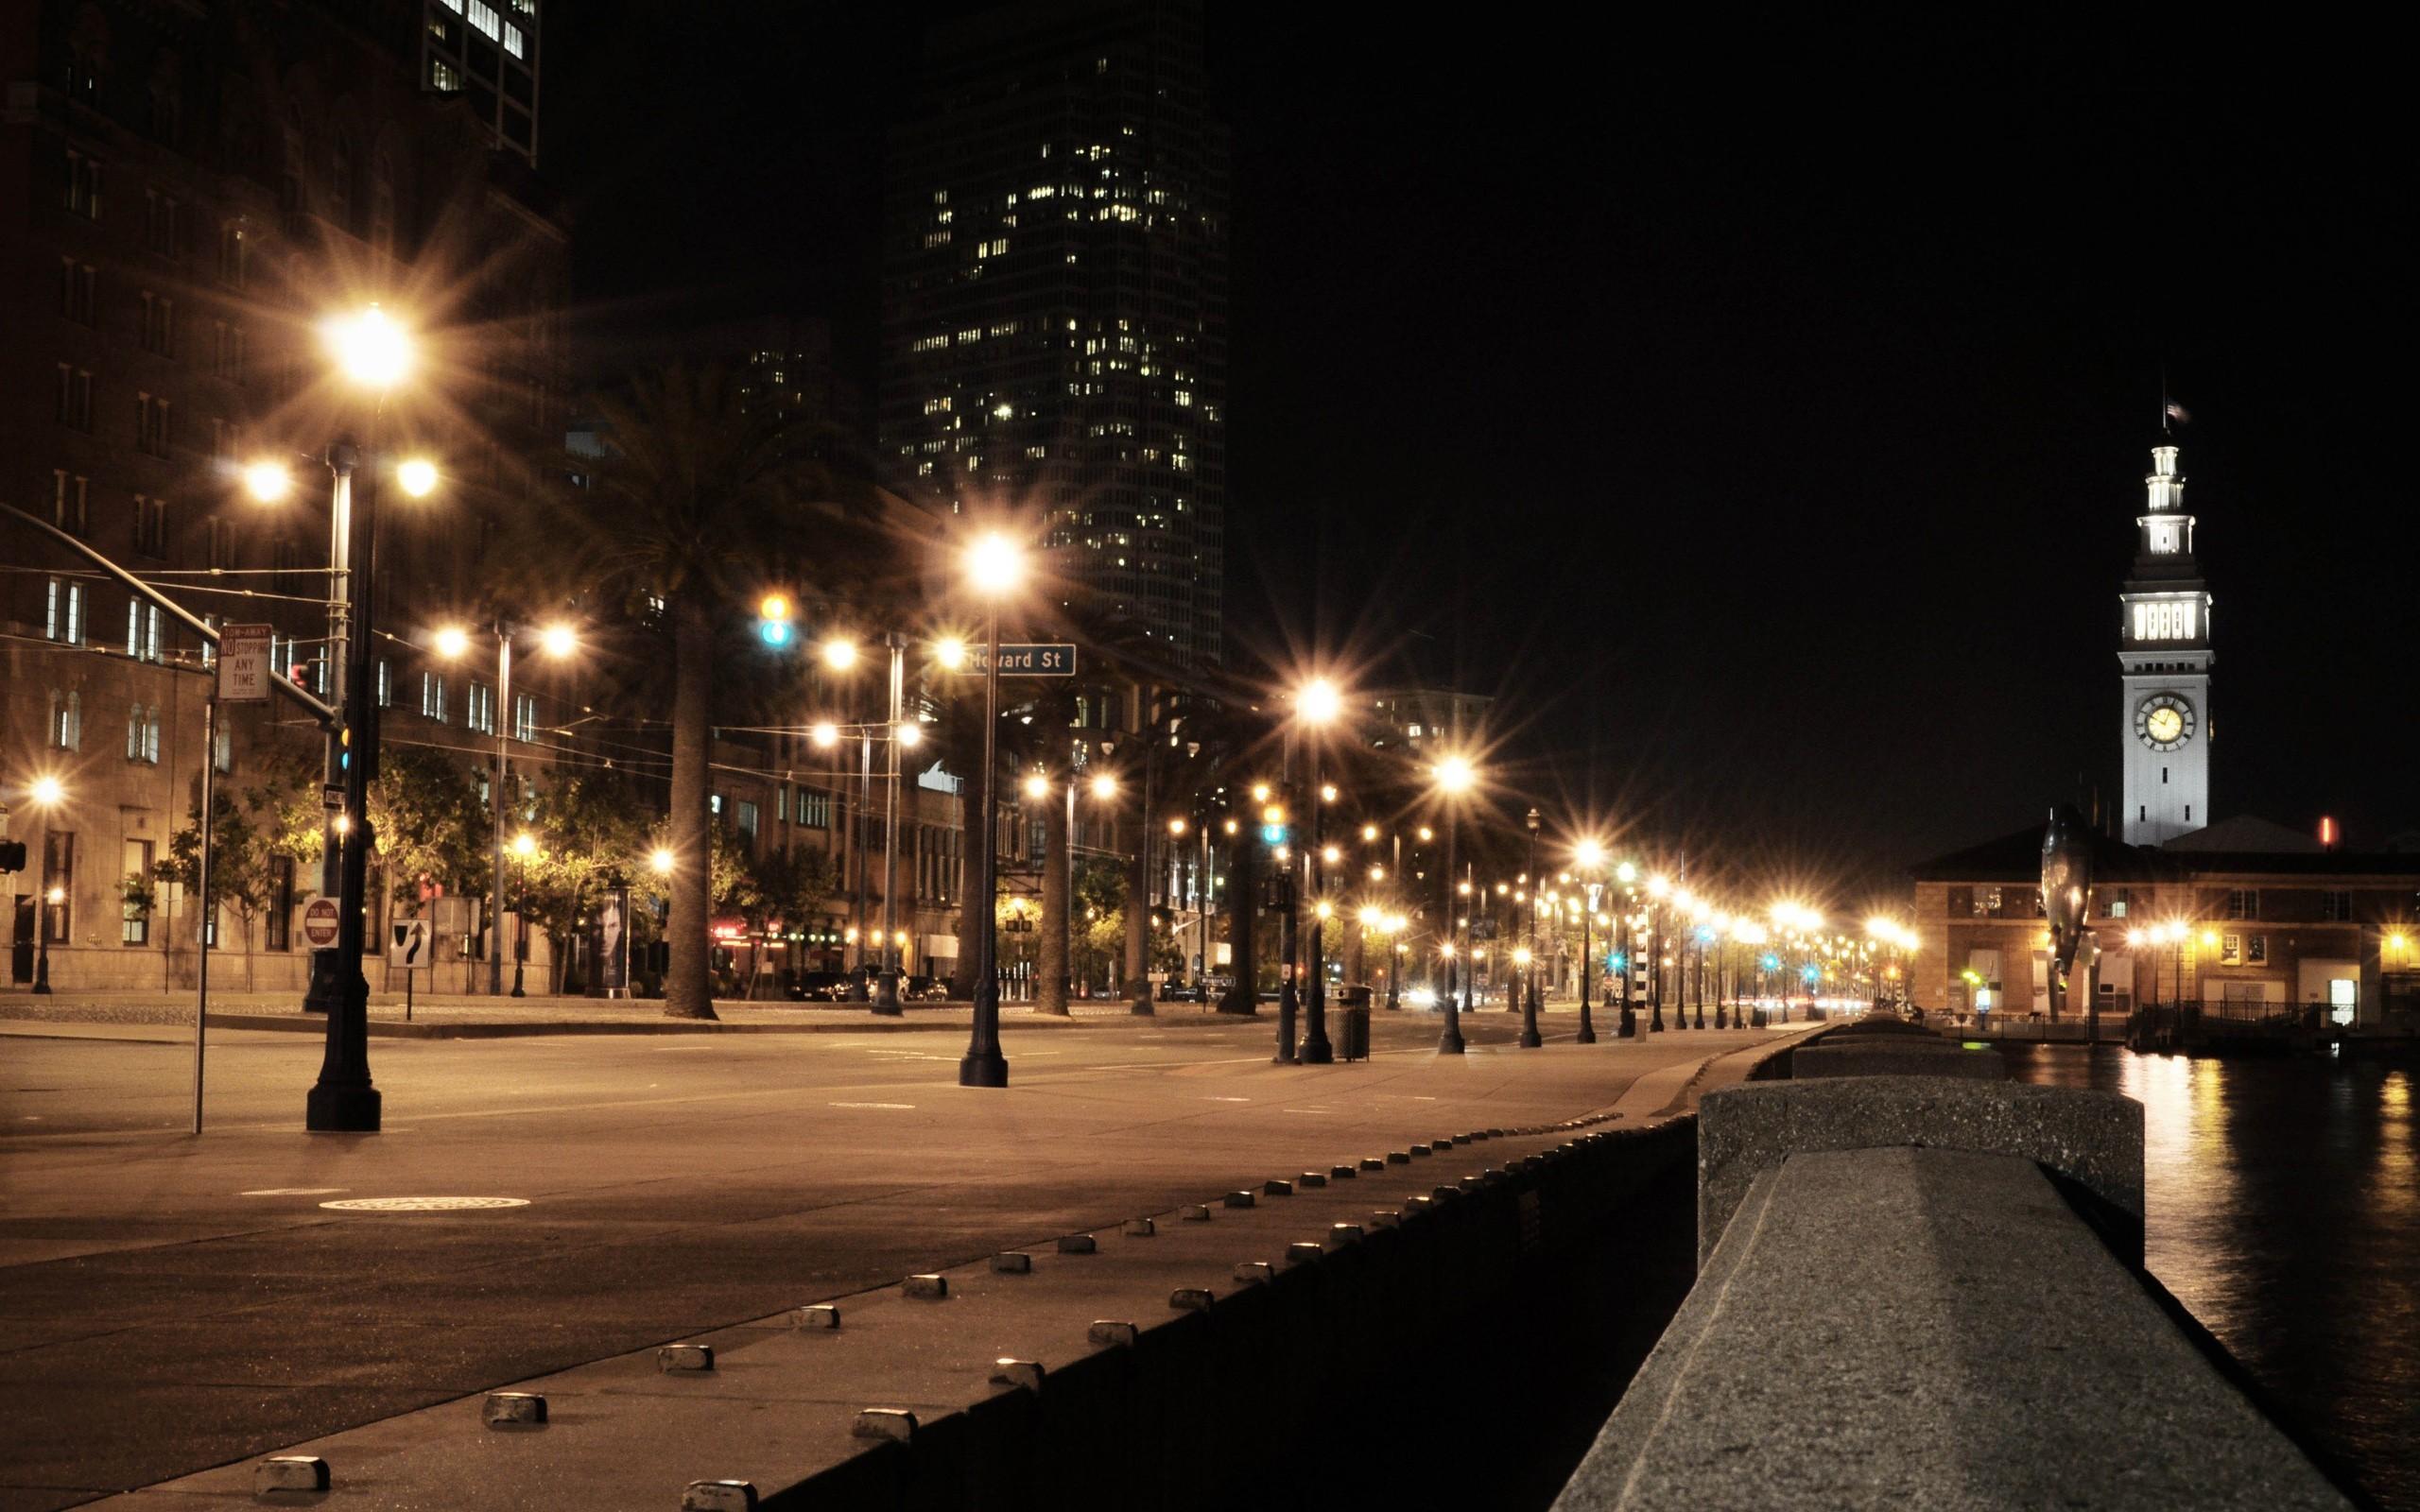 City Street Night Wallpaper 2014 HD   I HD Images